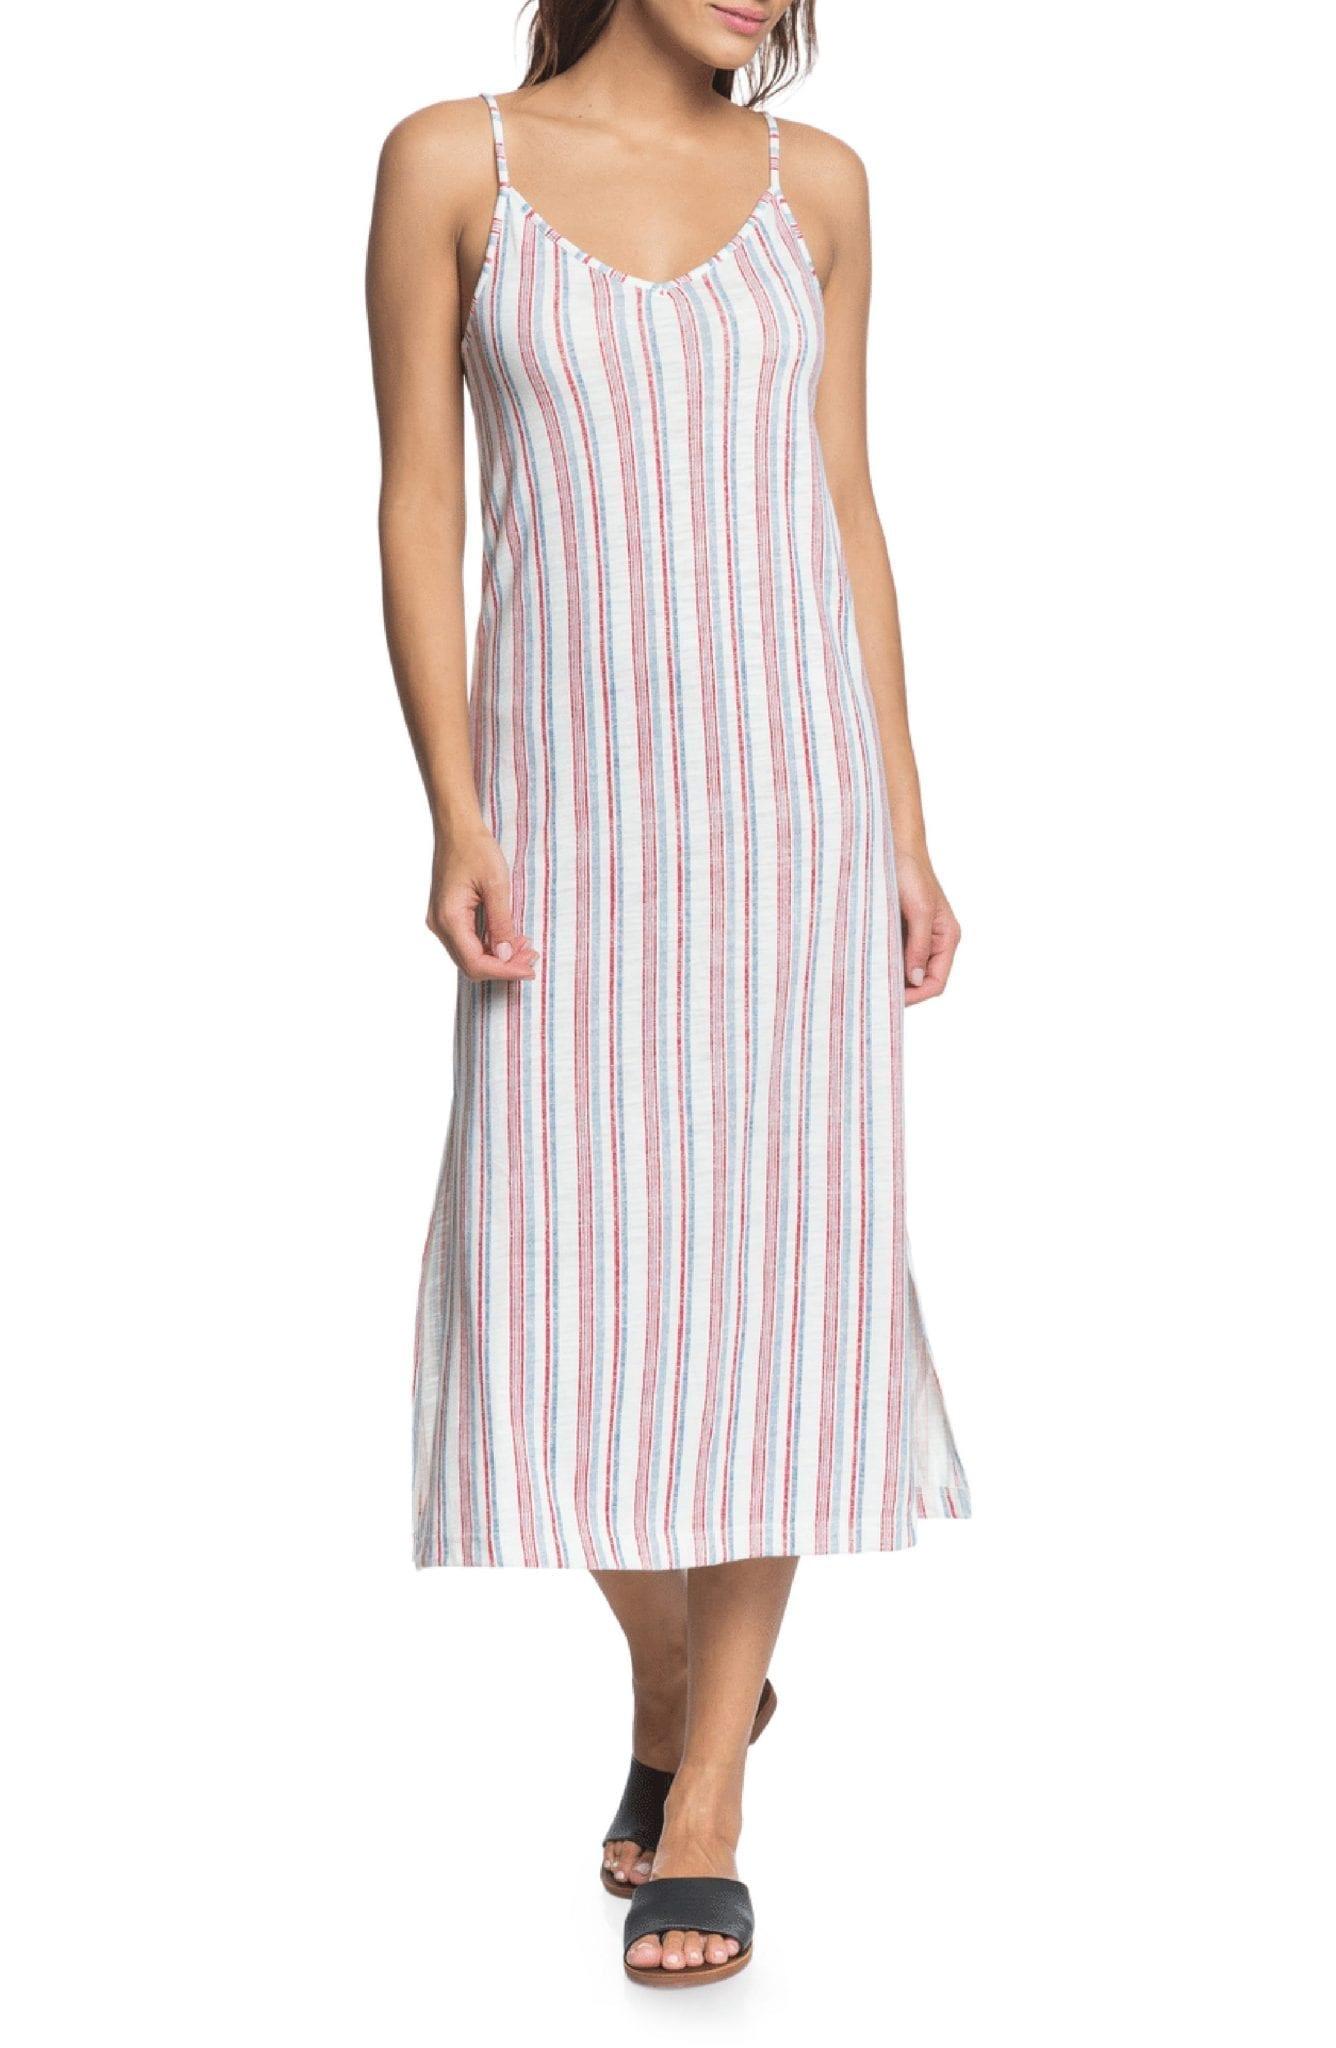 ROXY Avila Beach Stripe Sleeveless Midi Dress